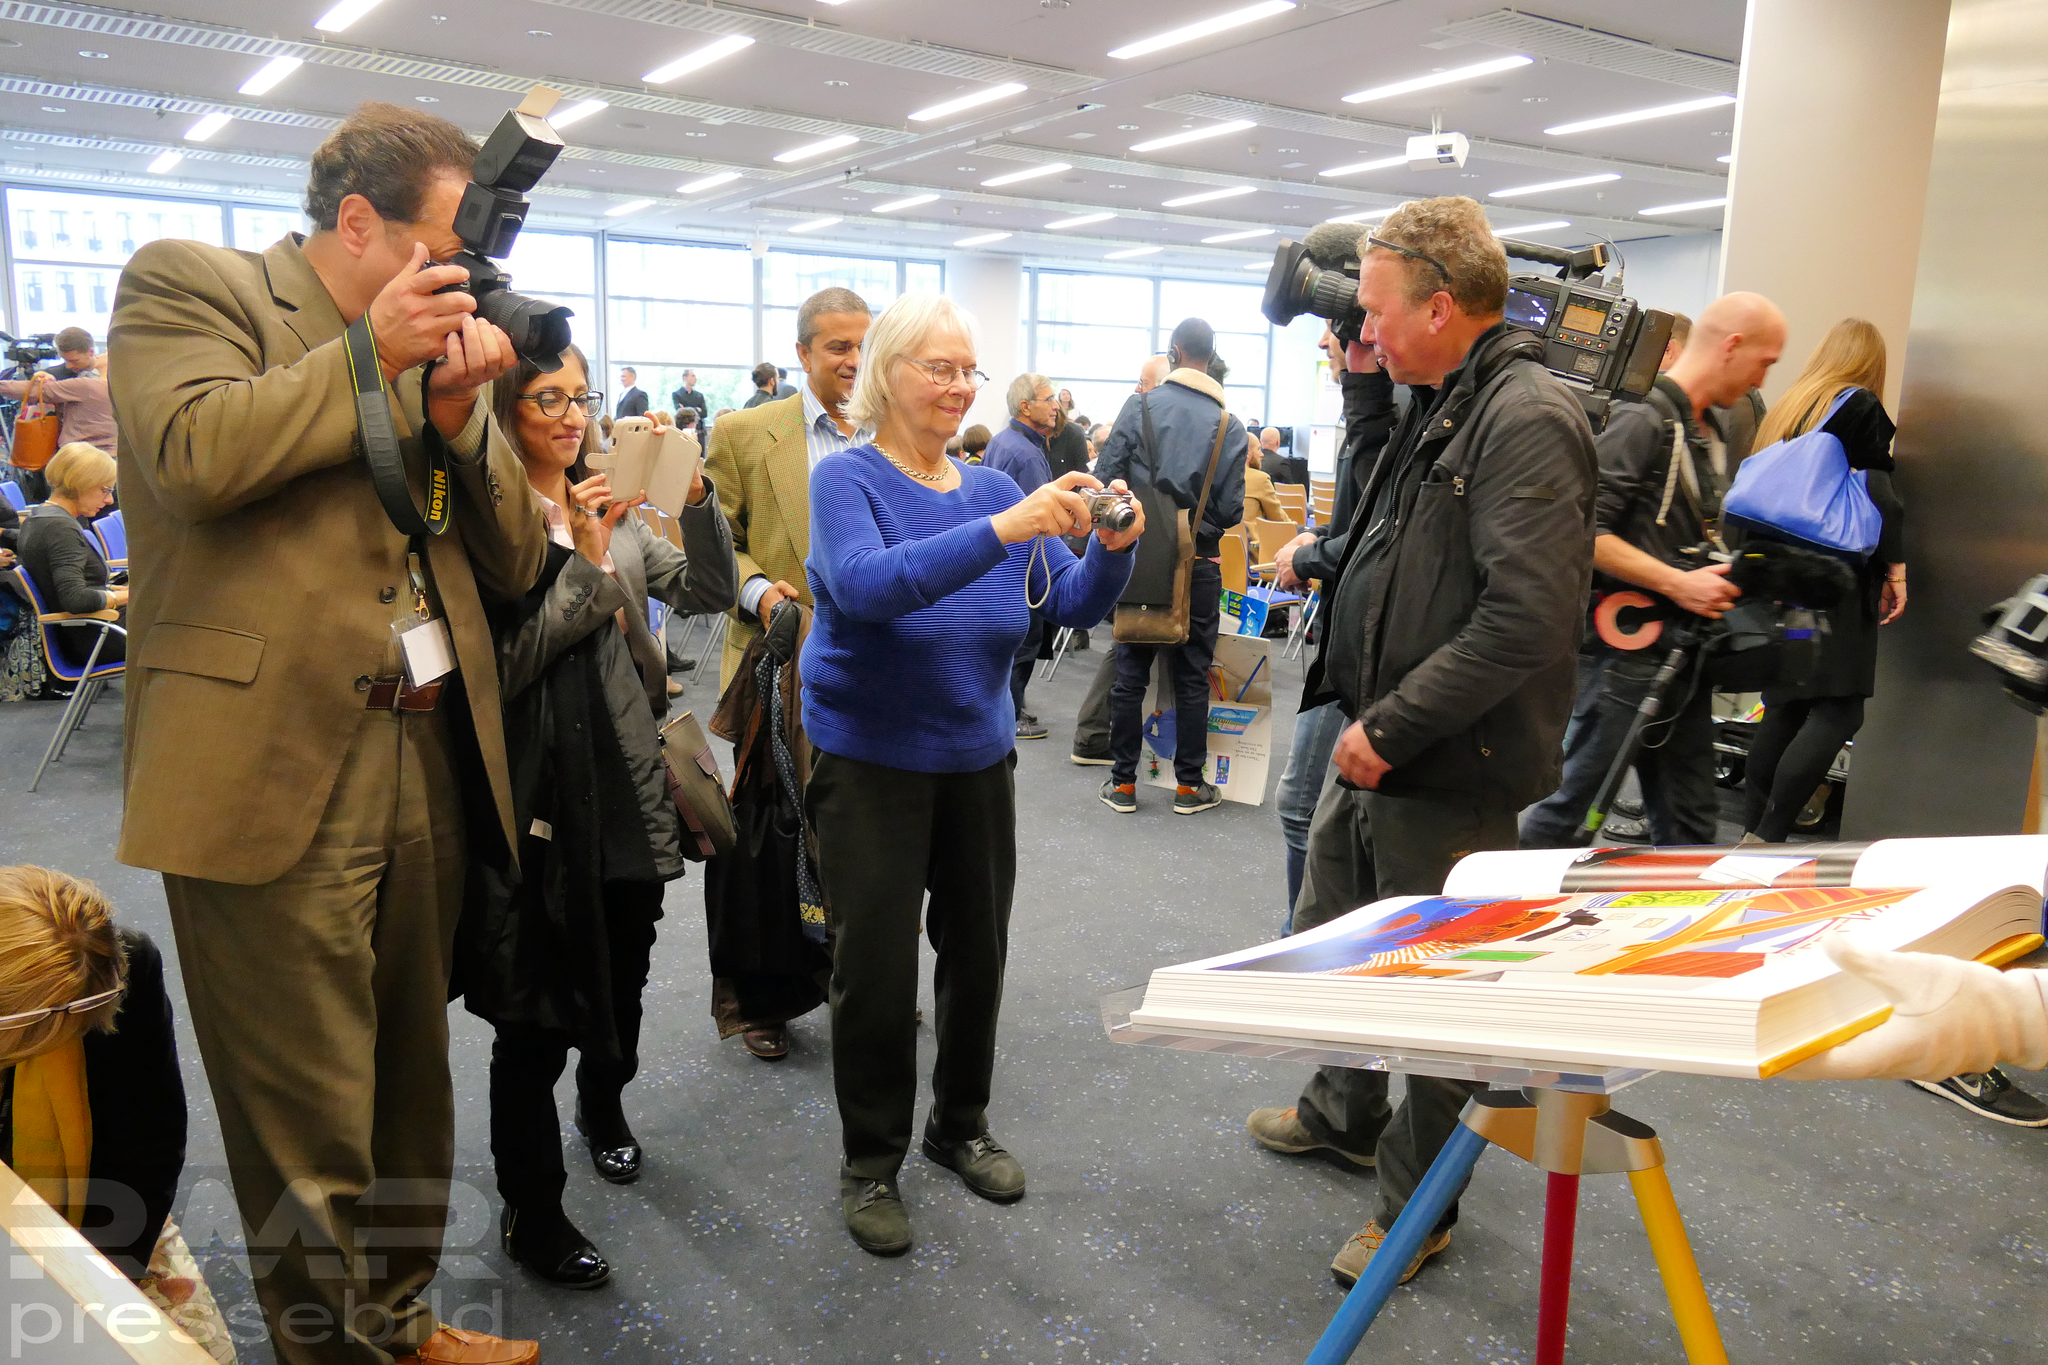 Medieninteresse © Klaus Leitzbach/frankfurtphoto